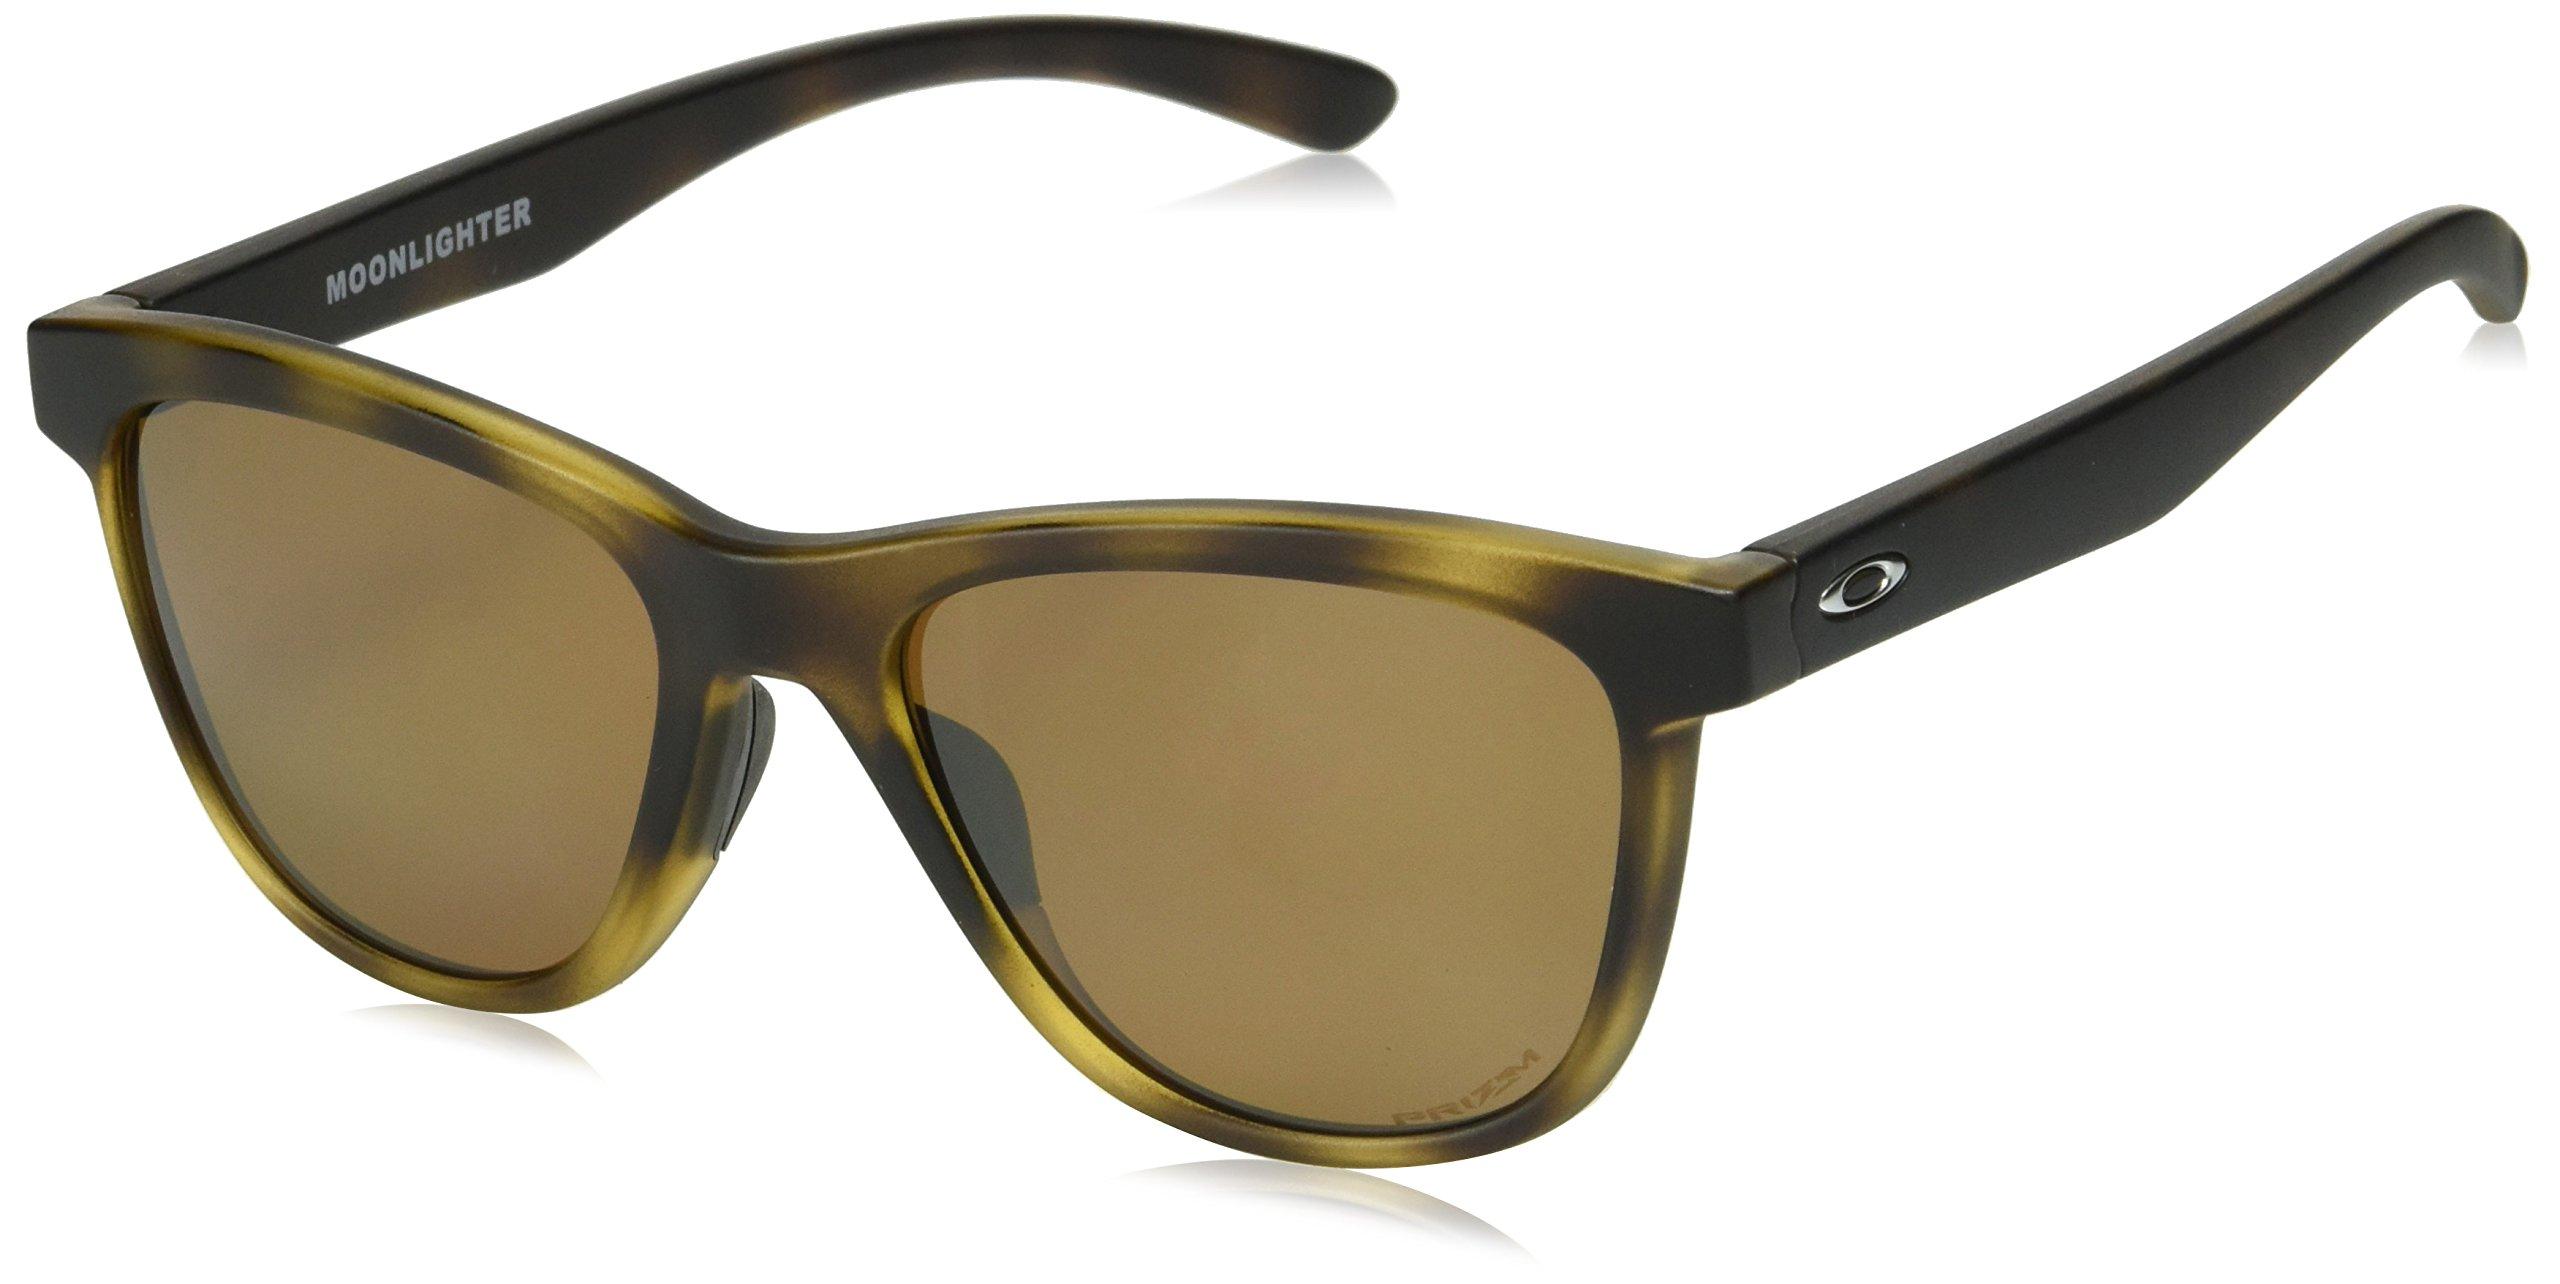 9ce8a561f3 Oakley Womens Moonlighter Sunglasses (OO9320) Plastic